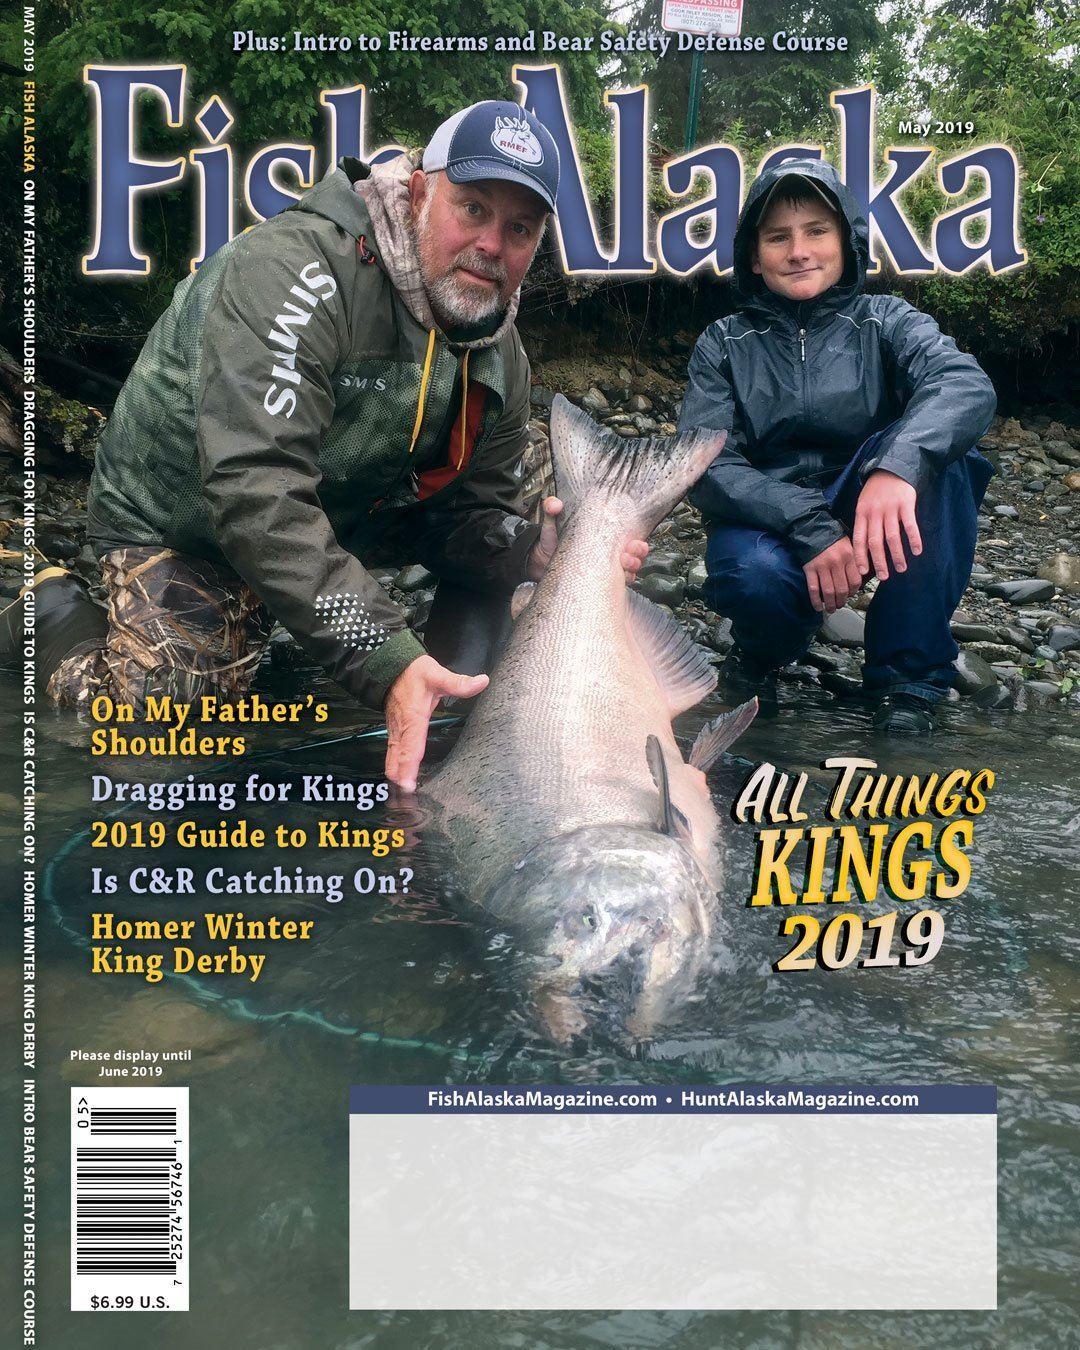 Alaska: Kenai River 2 Day of fully guided fishing trip, plus 3 Nights Vacation Rental for 4 Anglers.